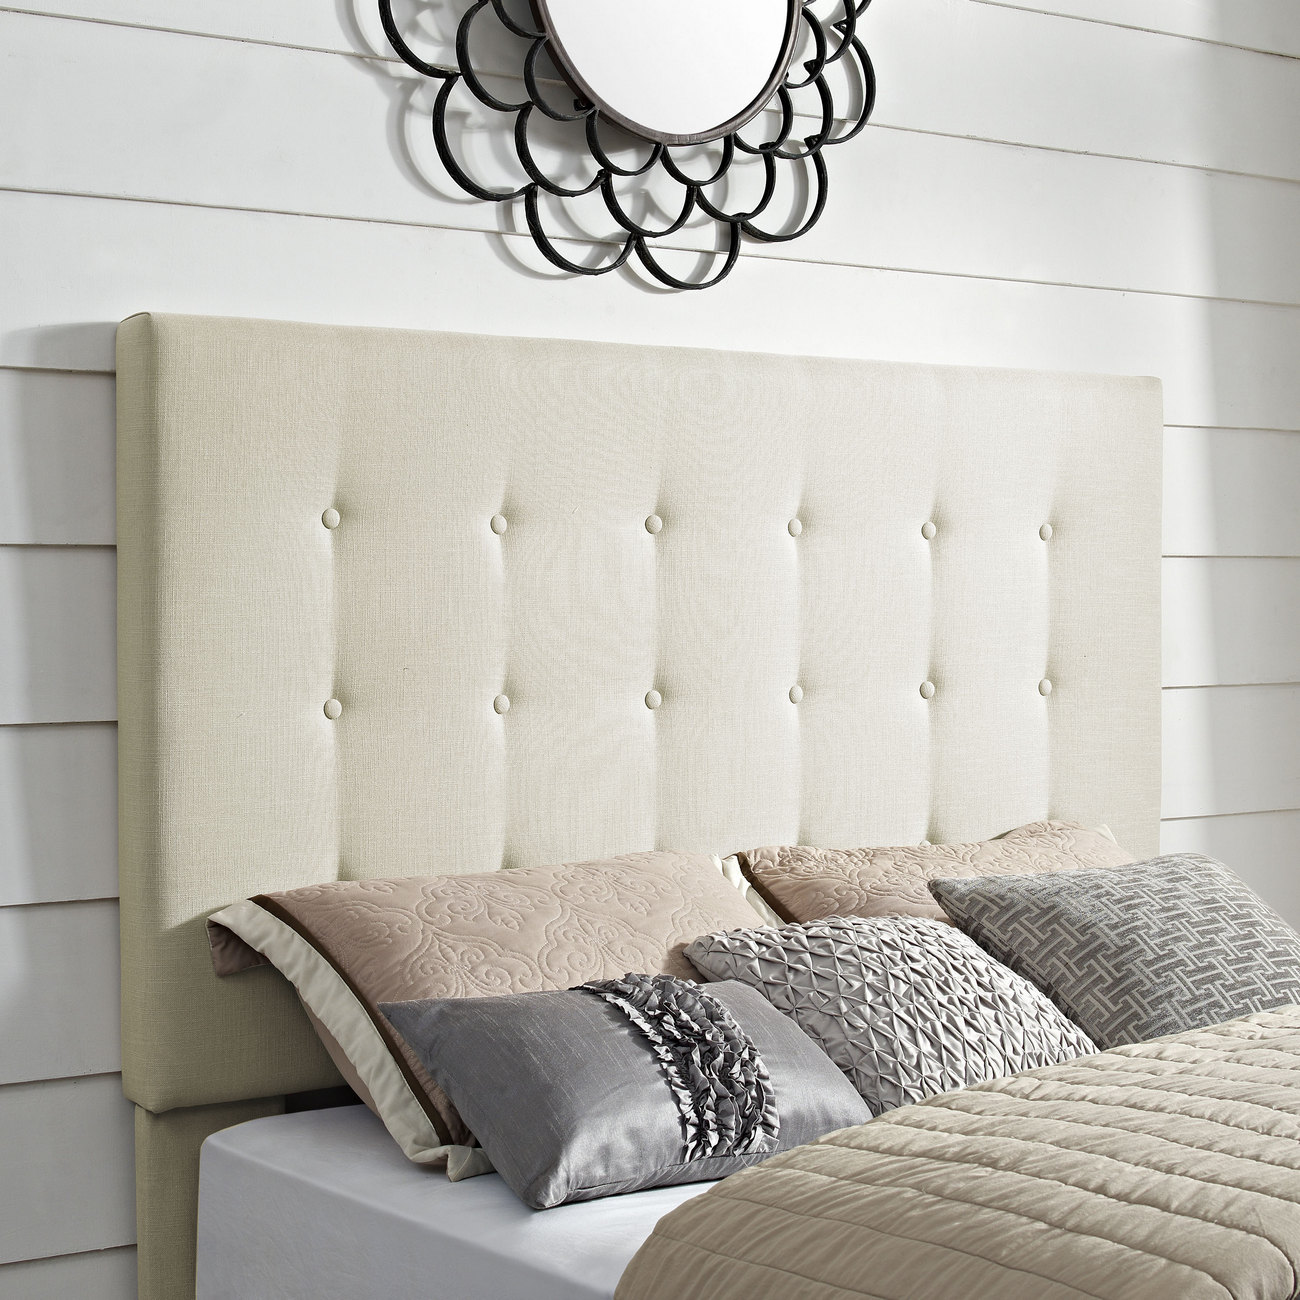 Reston Square Upholstered Fullqueen Headboard In Creme Linen Crosley Cf90005 501cr